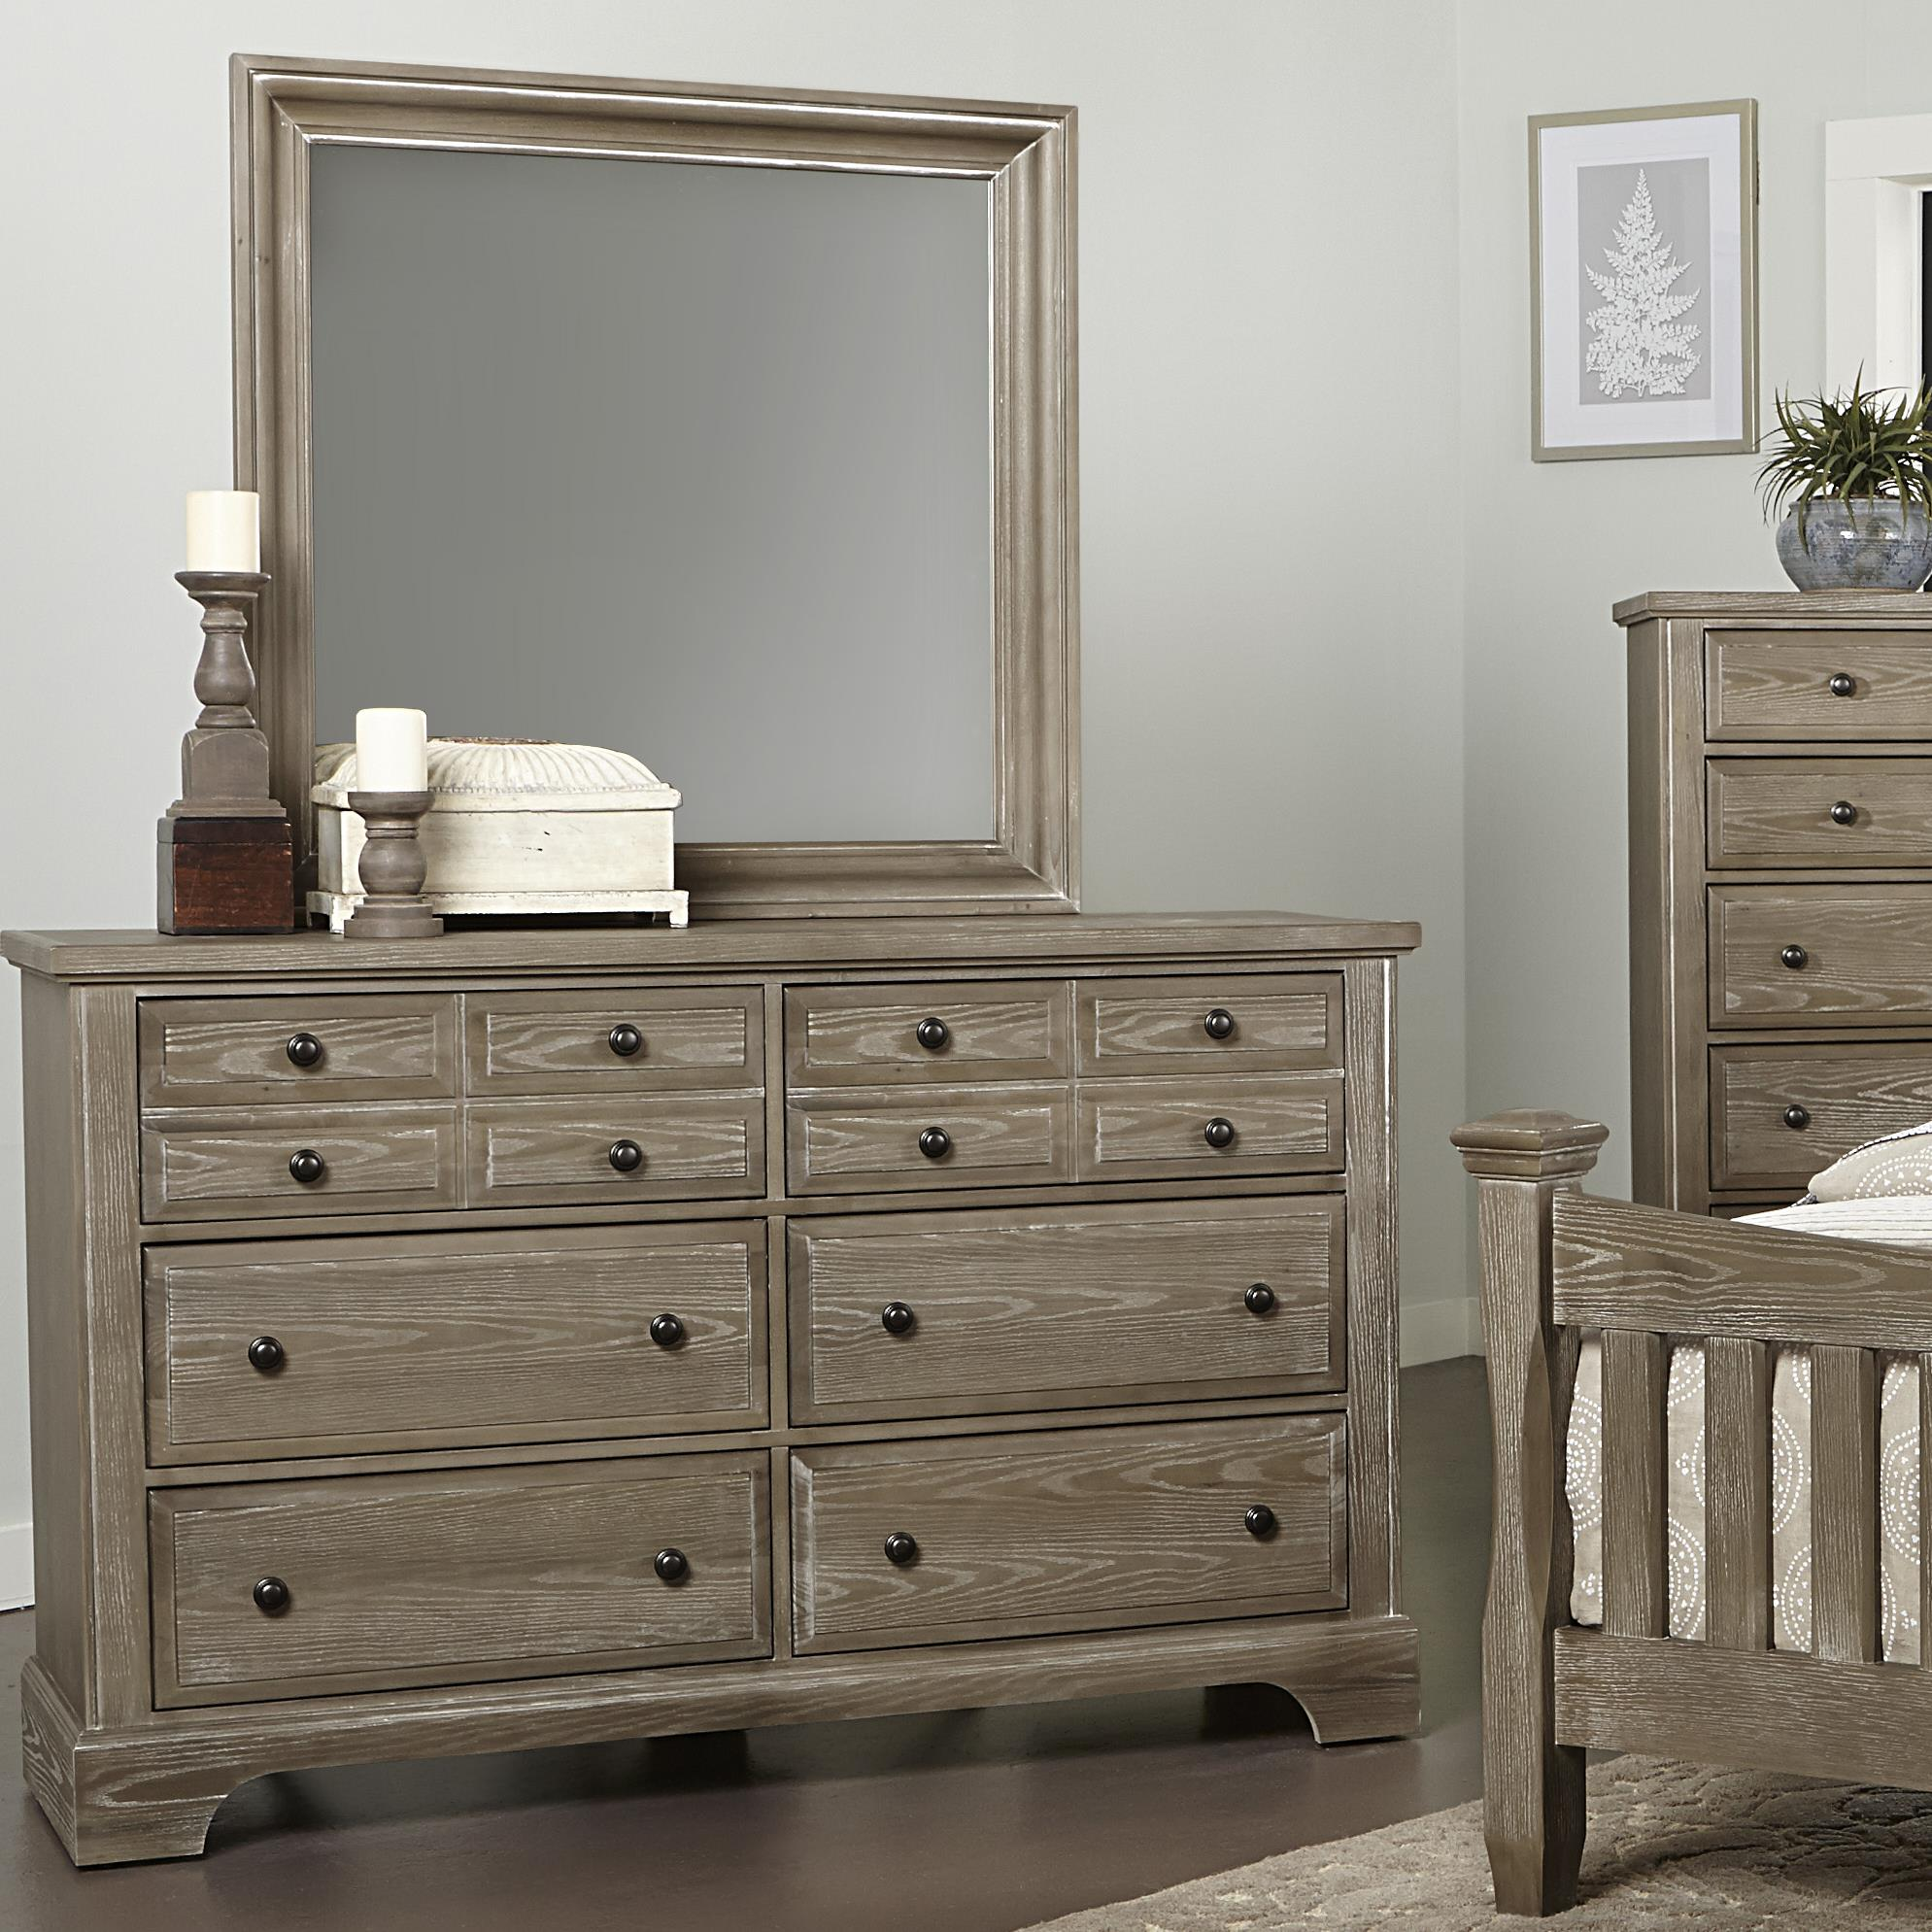 Vaughan Bassett Bedford Dresser - 6 drawers & Landscape Mirror - Item Number: BB81-002+445